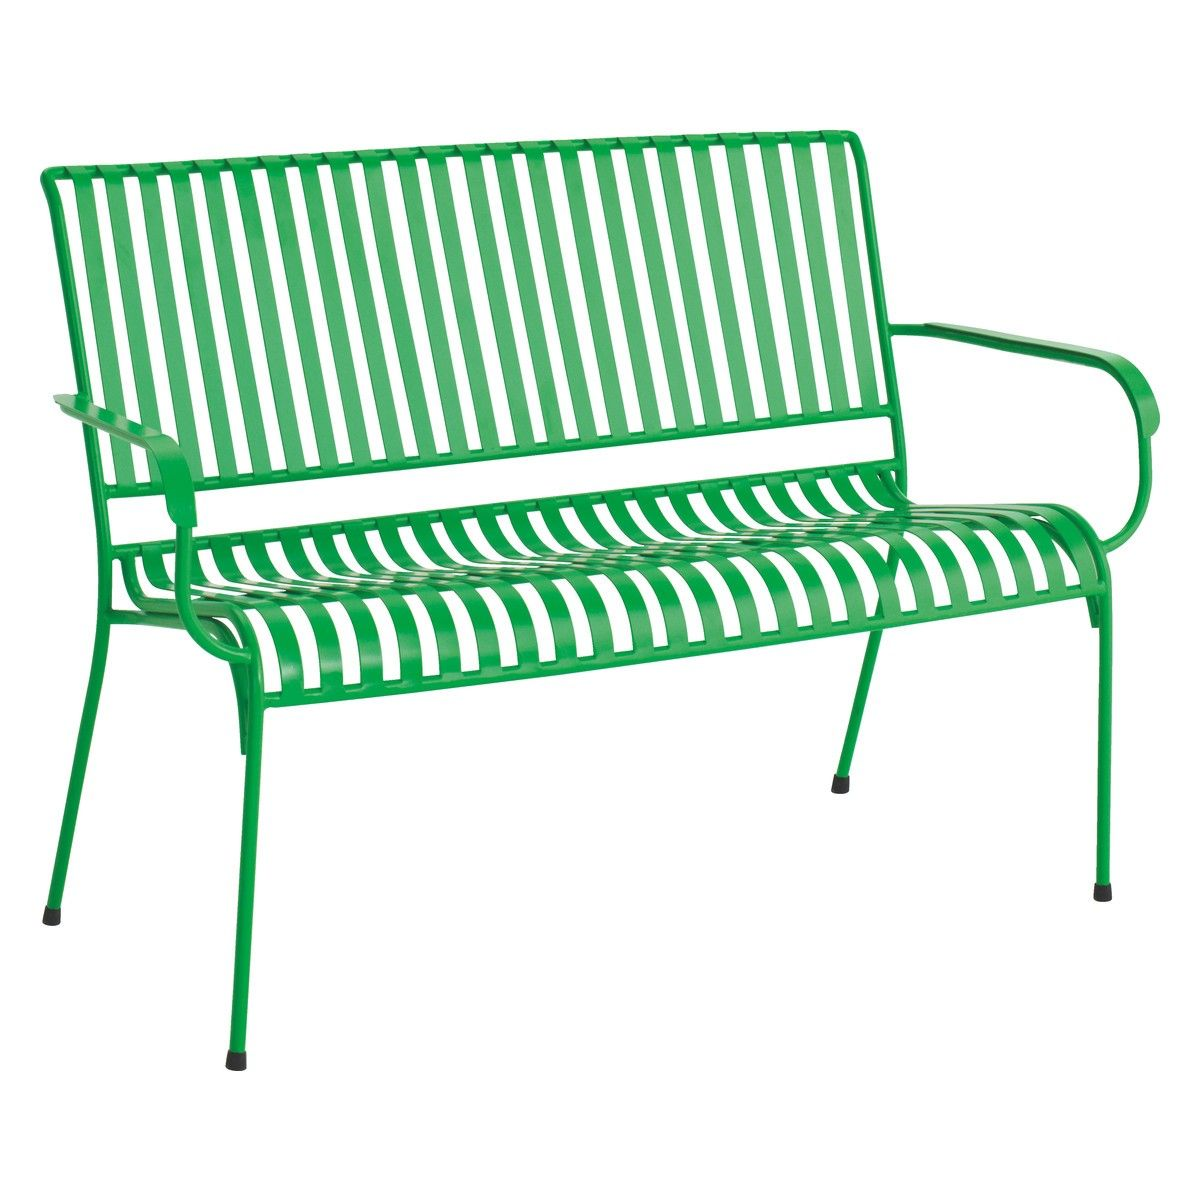 Stupendous Indu Green Metal Garden Bench Buy Now At Habitat Uk Bralicious Painted Fabric Chair Ideas Braliciousco